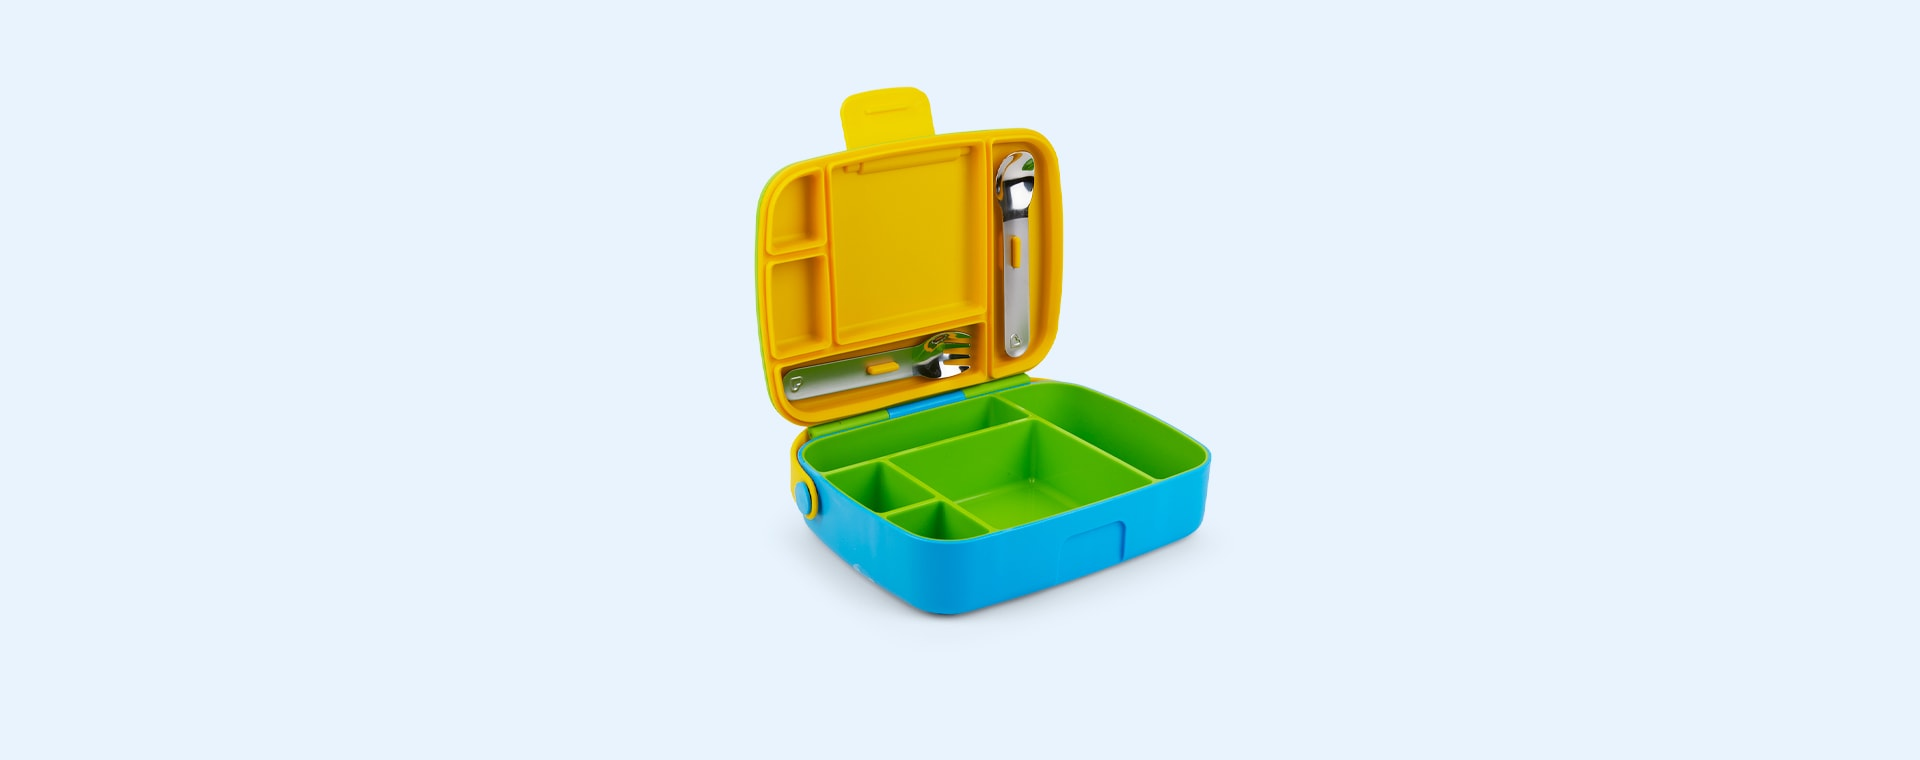 Yellow and Blue Munchkin Lunch Bento Box